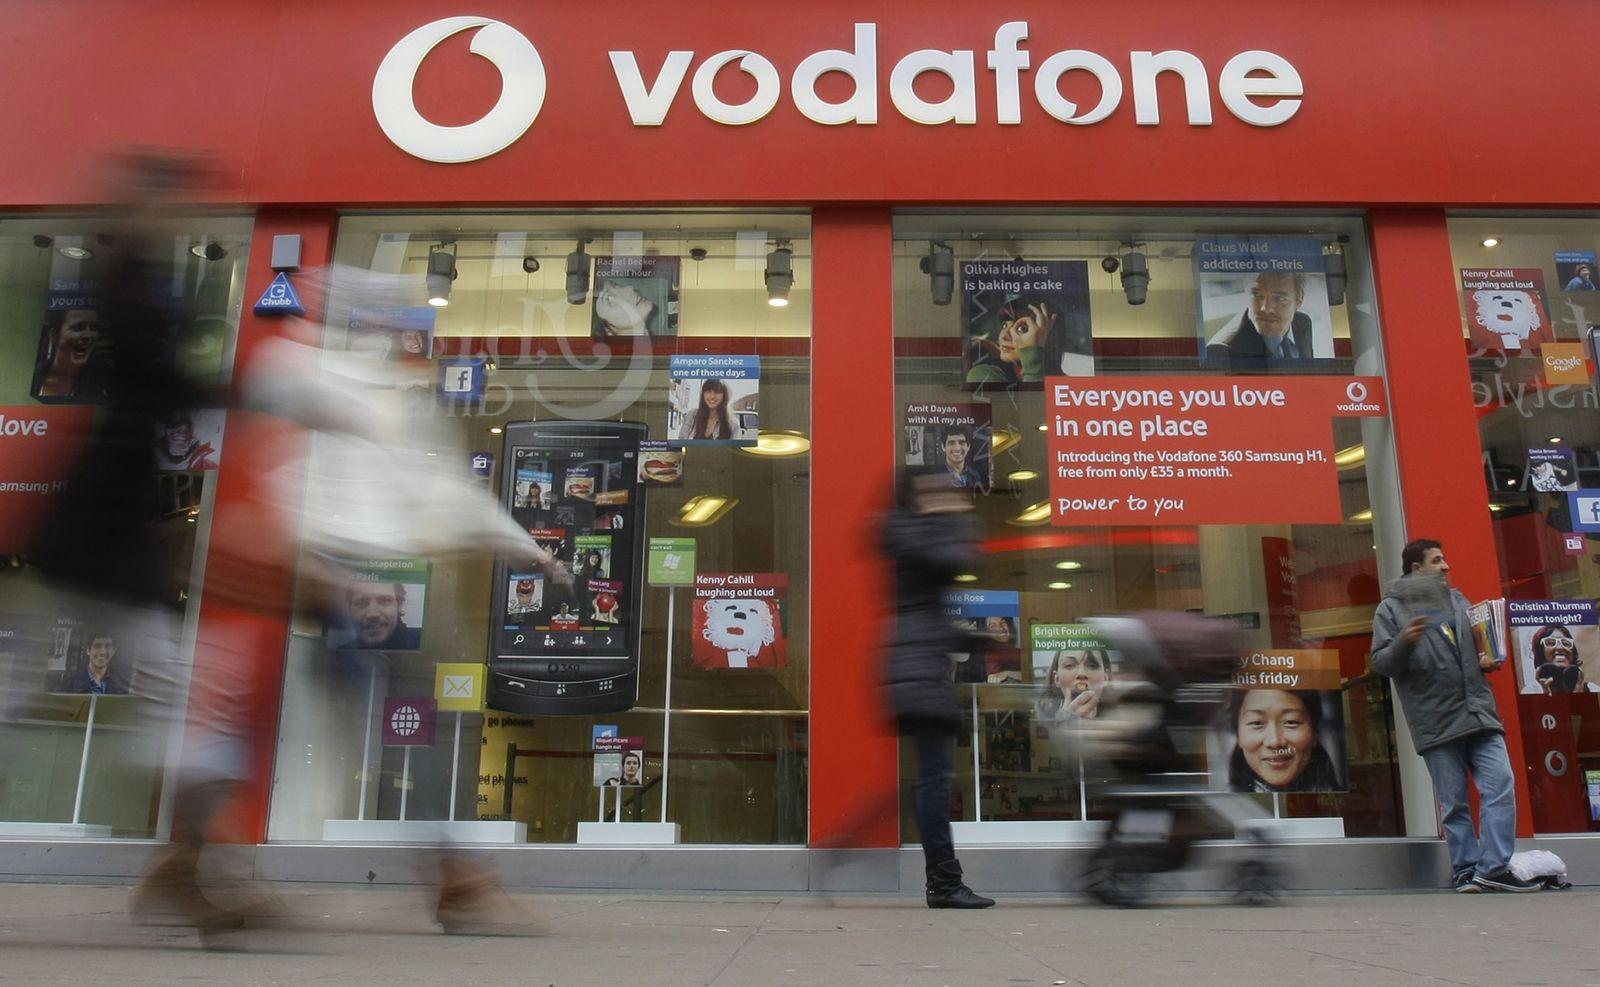 Marken international/ Vodafone